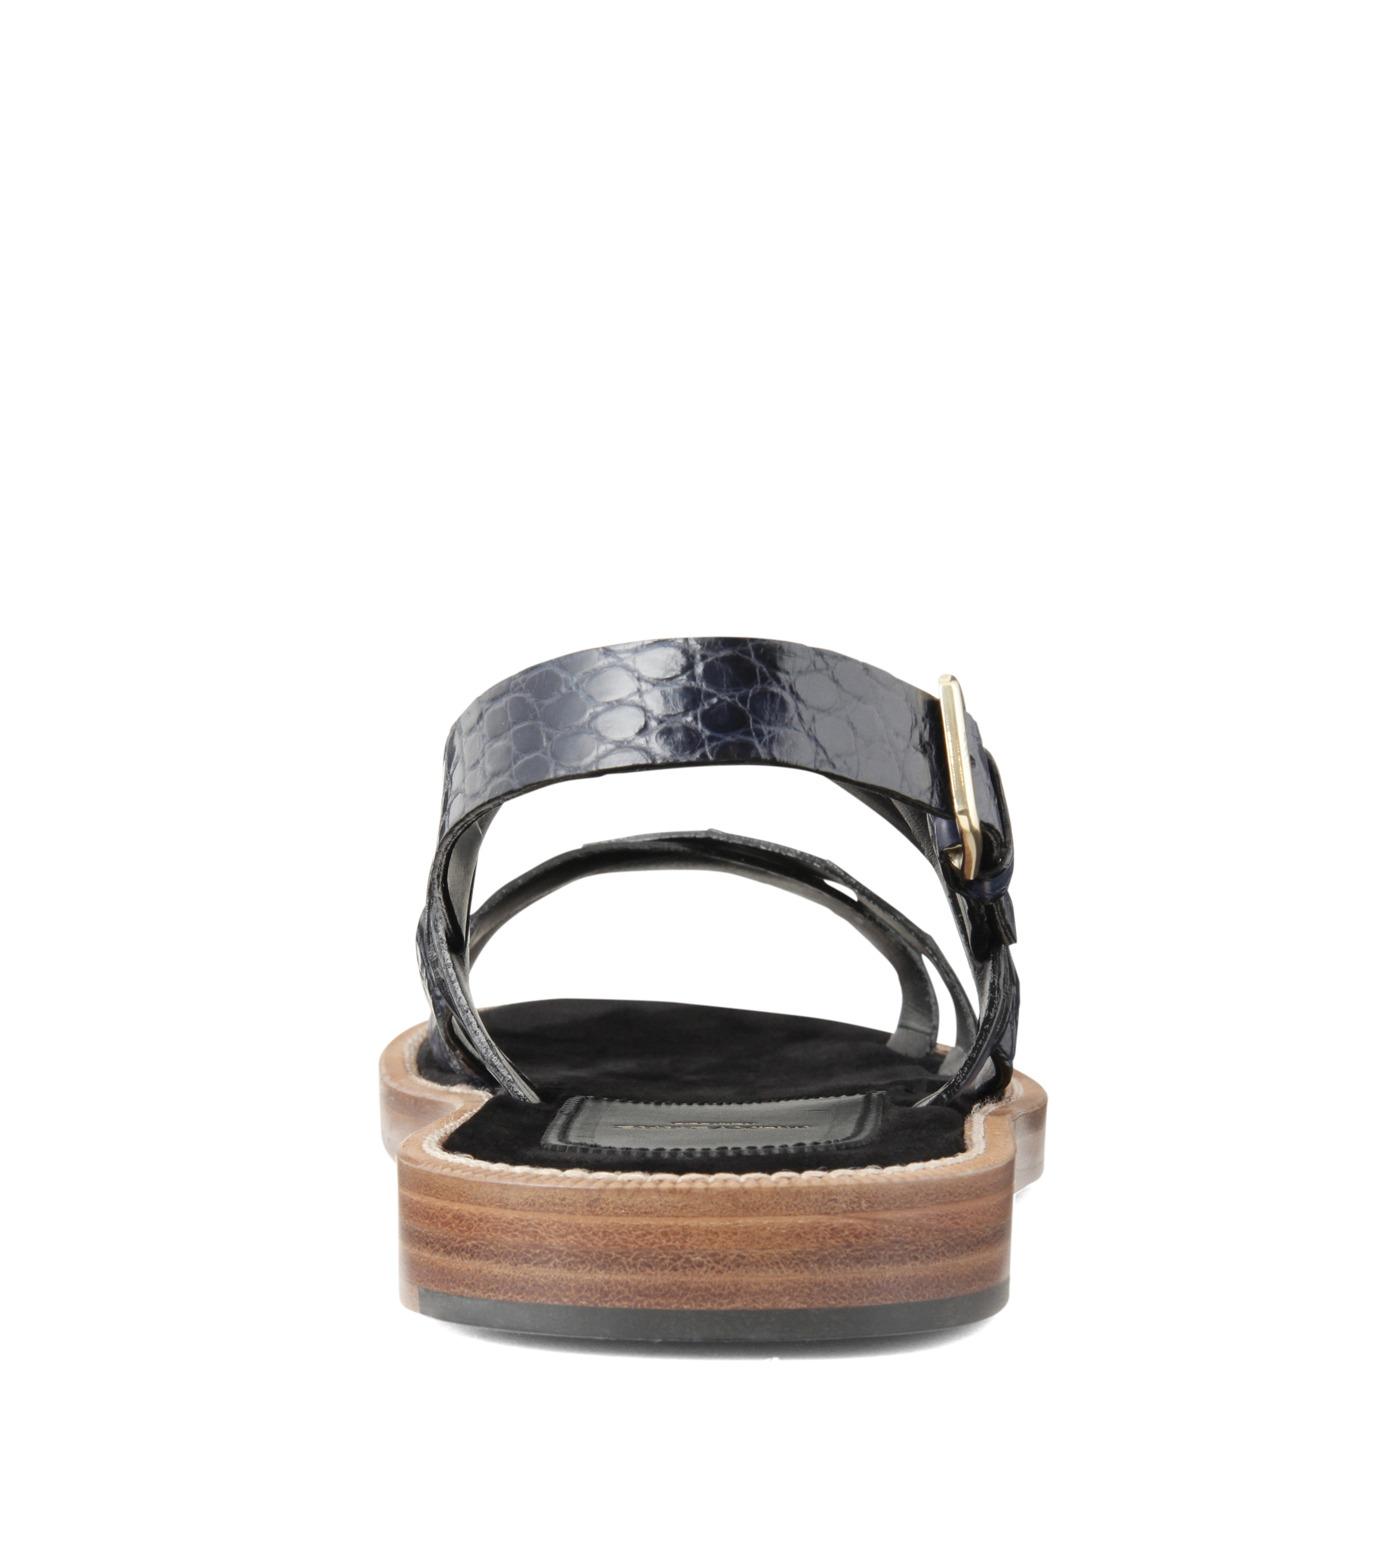 Max Verre(マックス ヴェッレ)のCross Strap Sandal-BLUE(シューズ/shoes)-MV918-POSITA-92 拡大詳細画像3